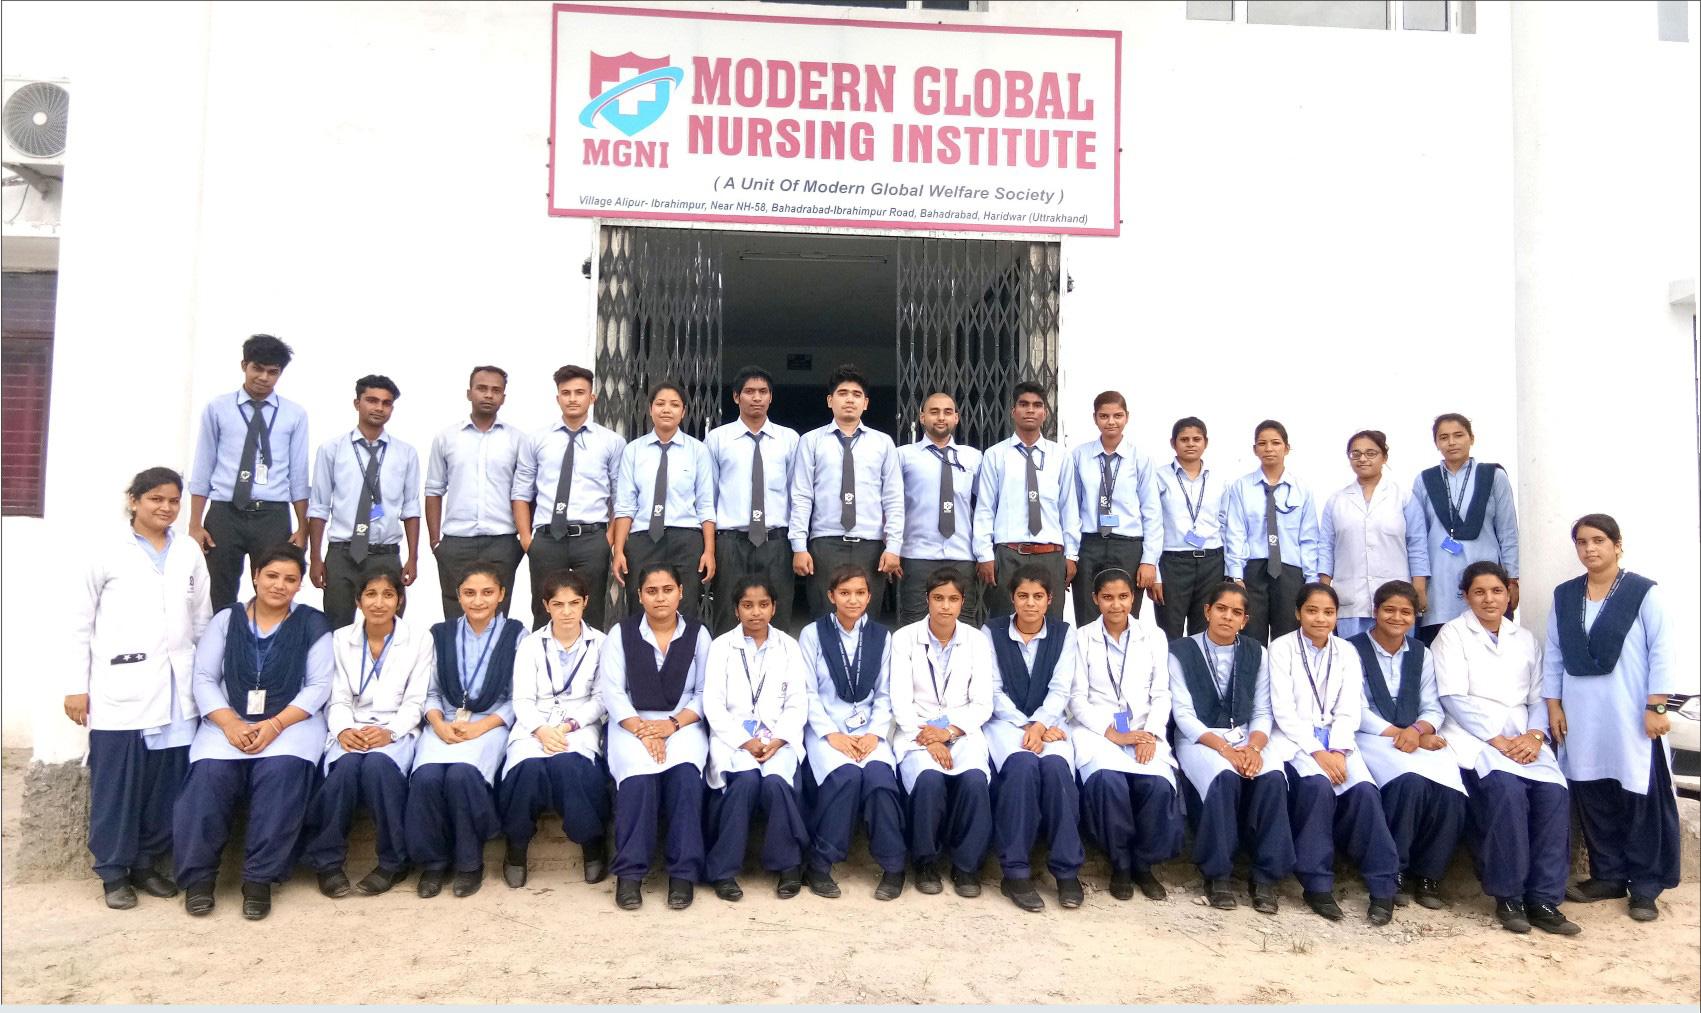 Modern Global Nursing Institute, Haridwar